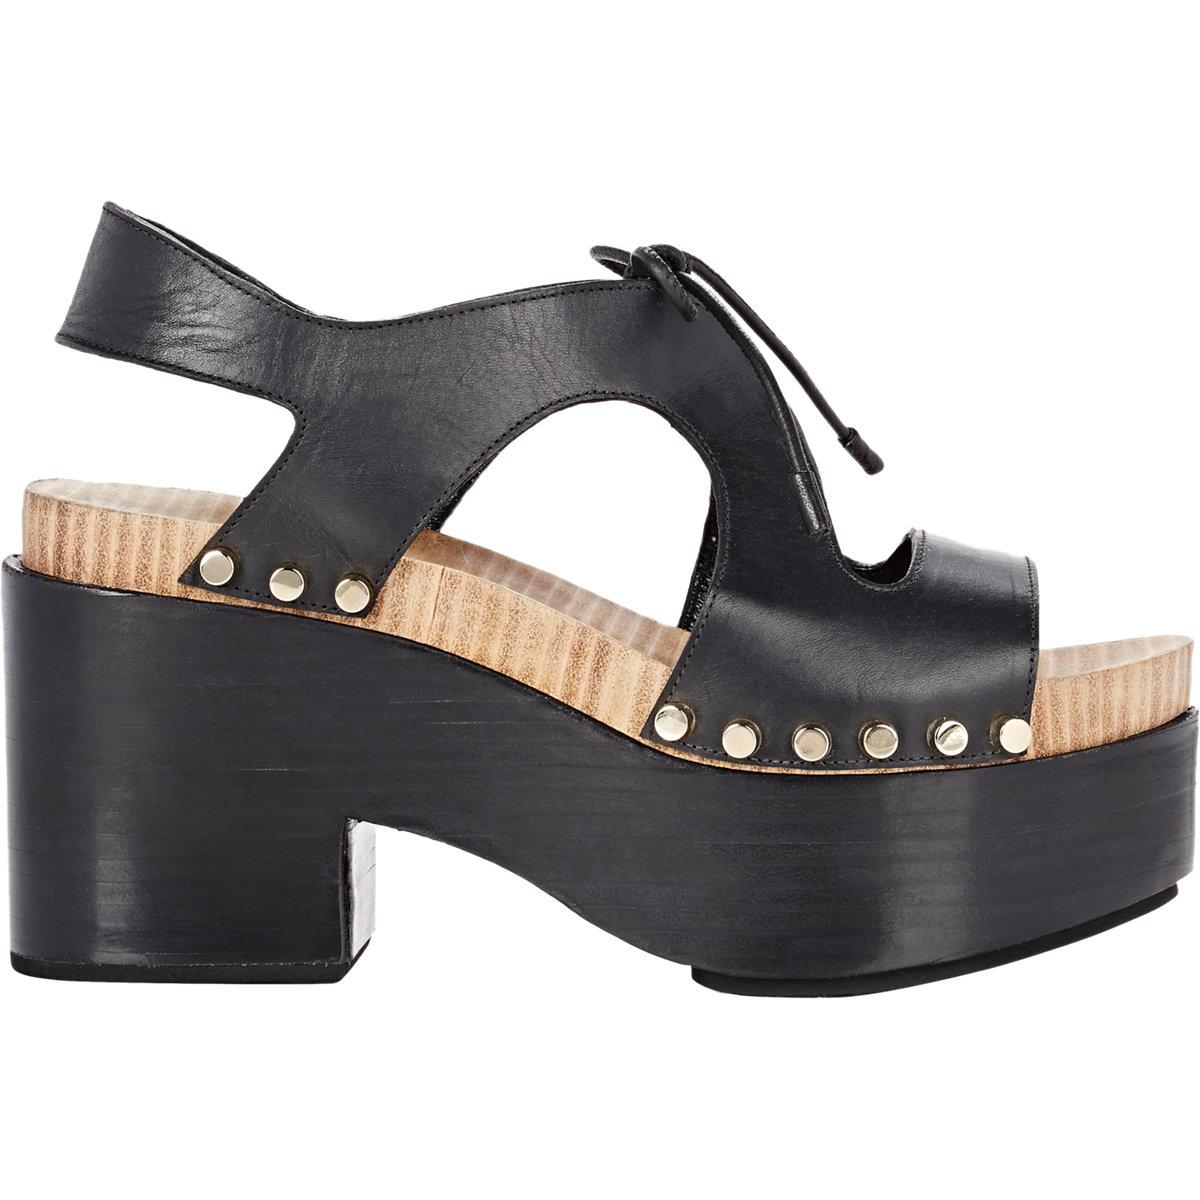 dceb05cd1e52 Lyst - Balenciaga Women s Platform Sandals in Black